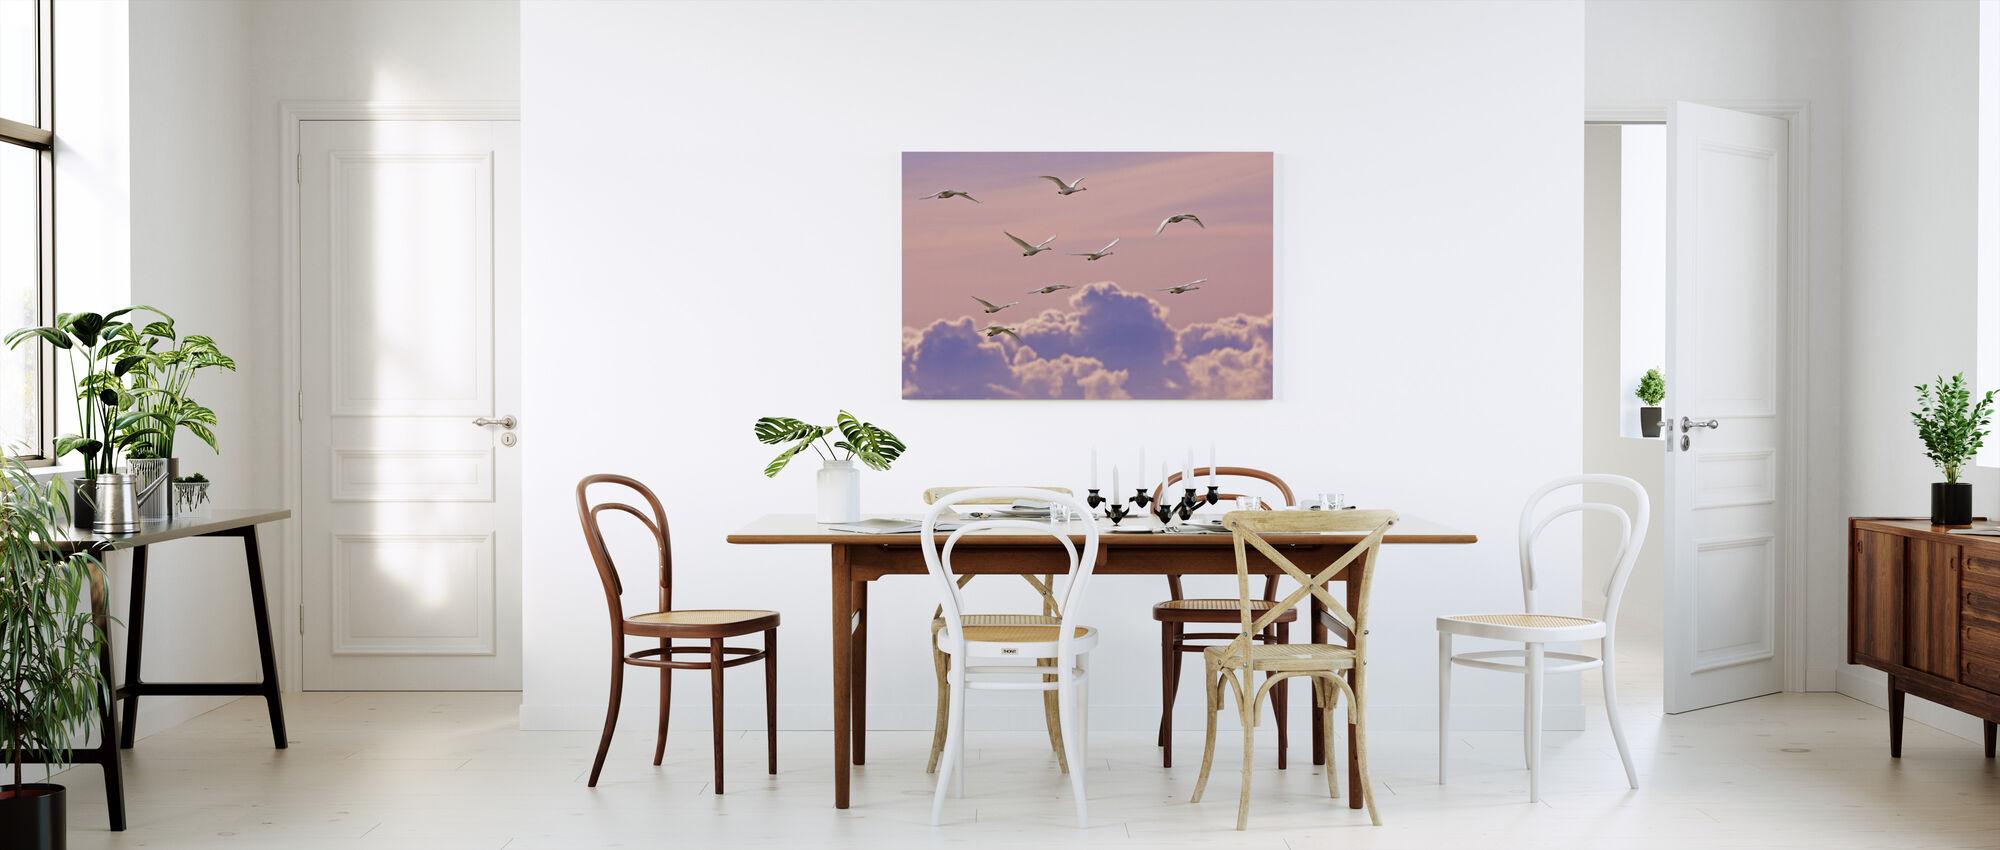 Whooper Swans - Canvas print - Kitchen